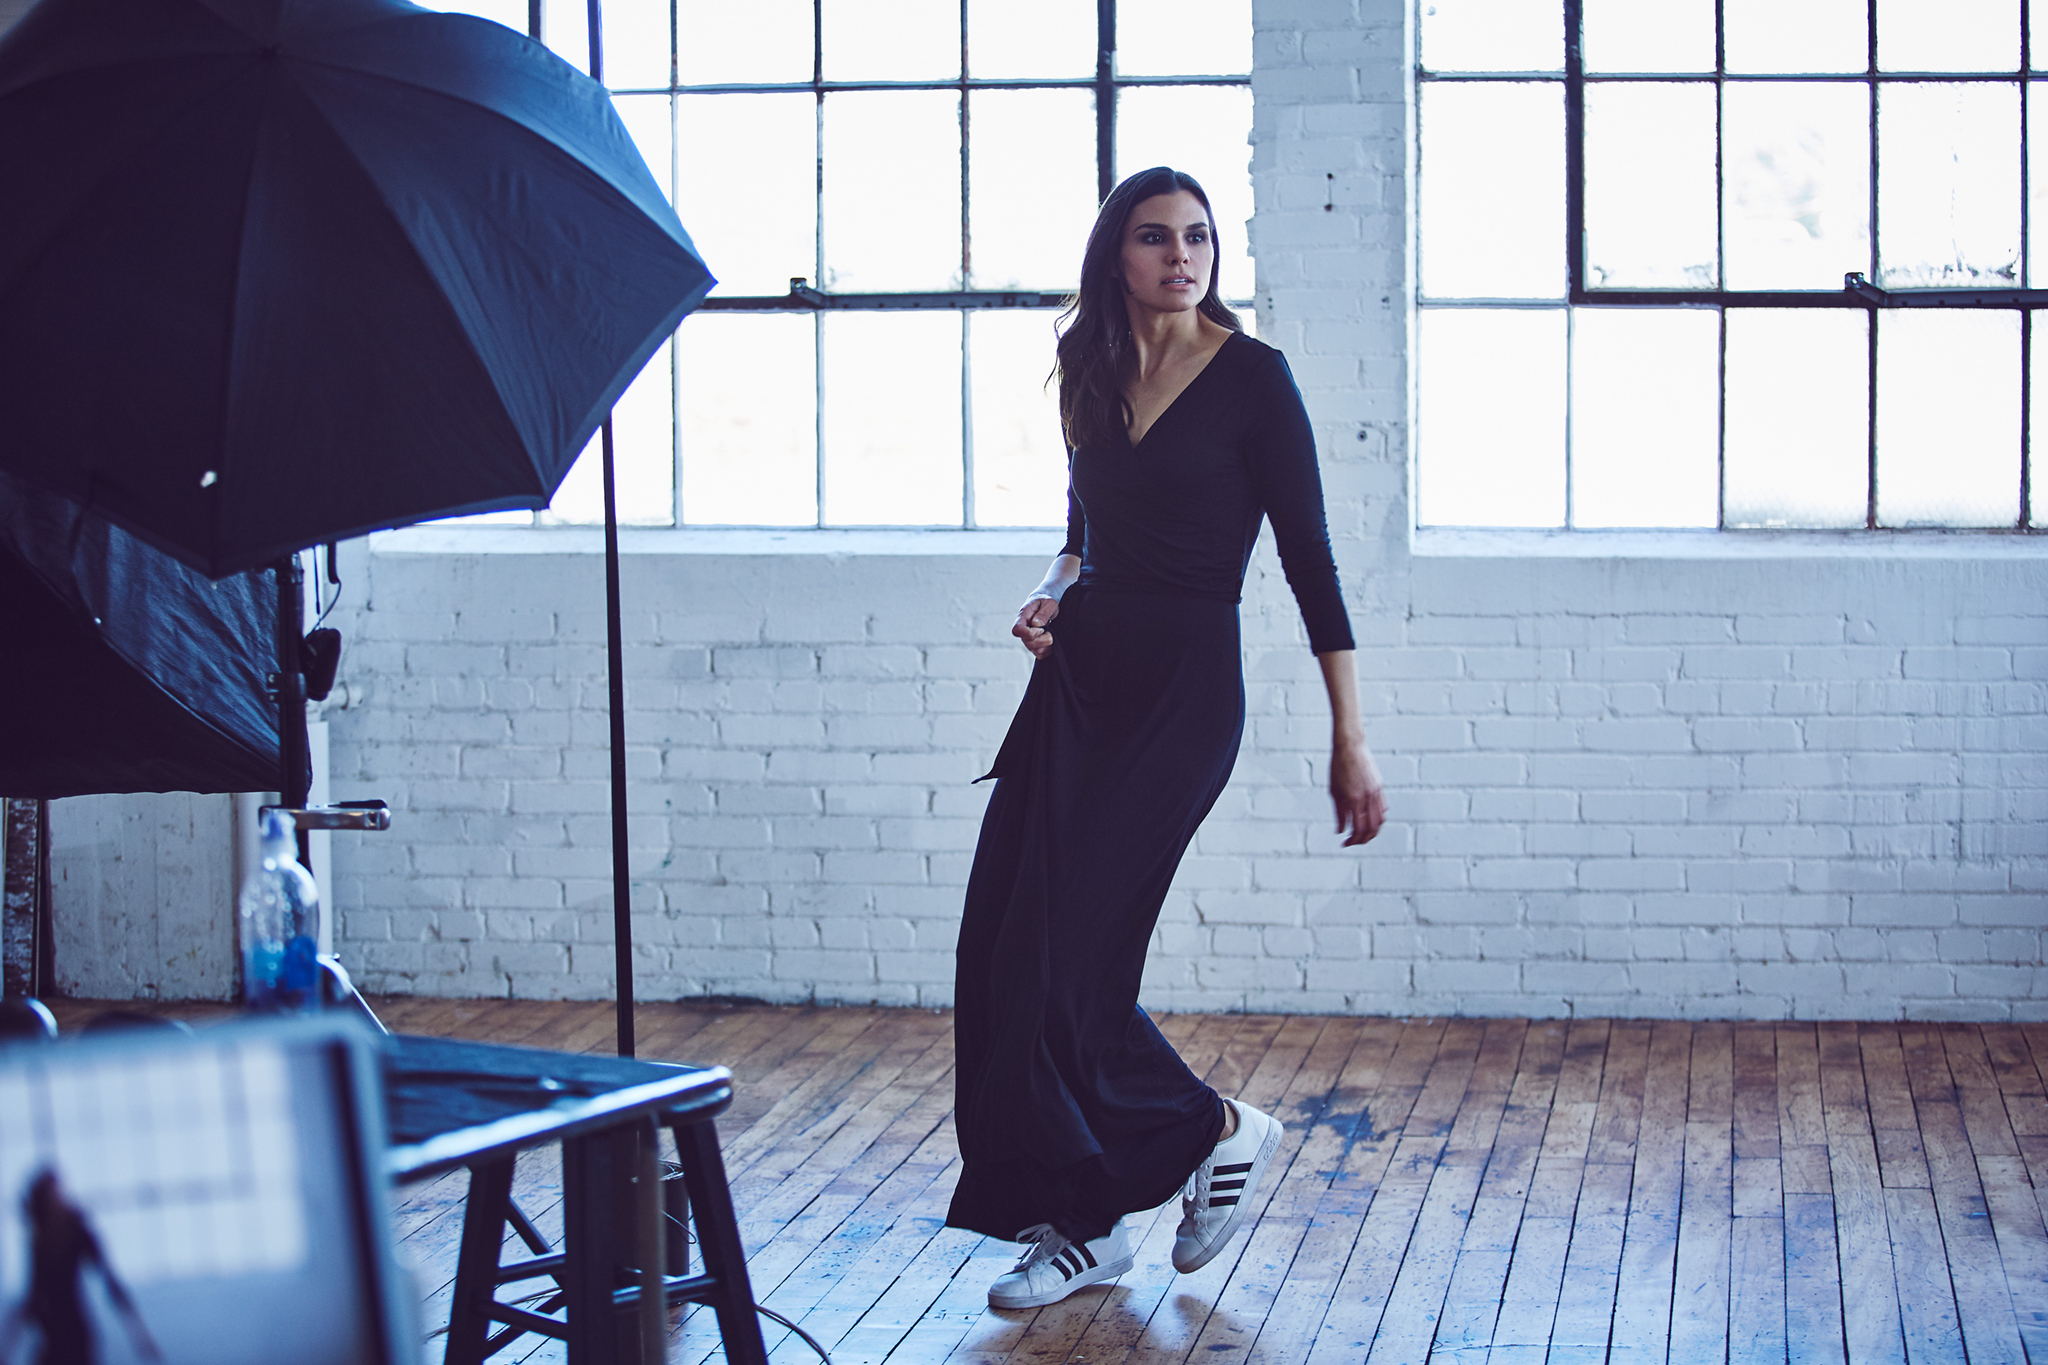 Nicole_Peelman_Portrait_Commercial_Model_Fashion_Shoot_Minneapolis_Photographer_Joe_Lemke_007.jpg